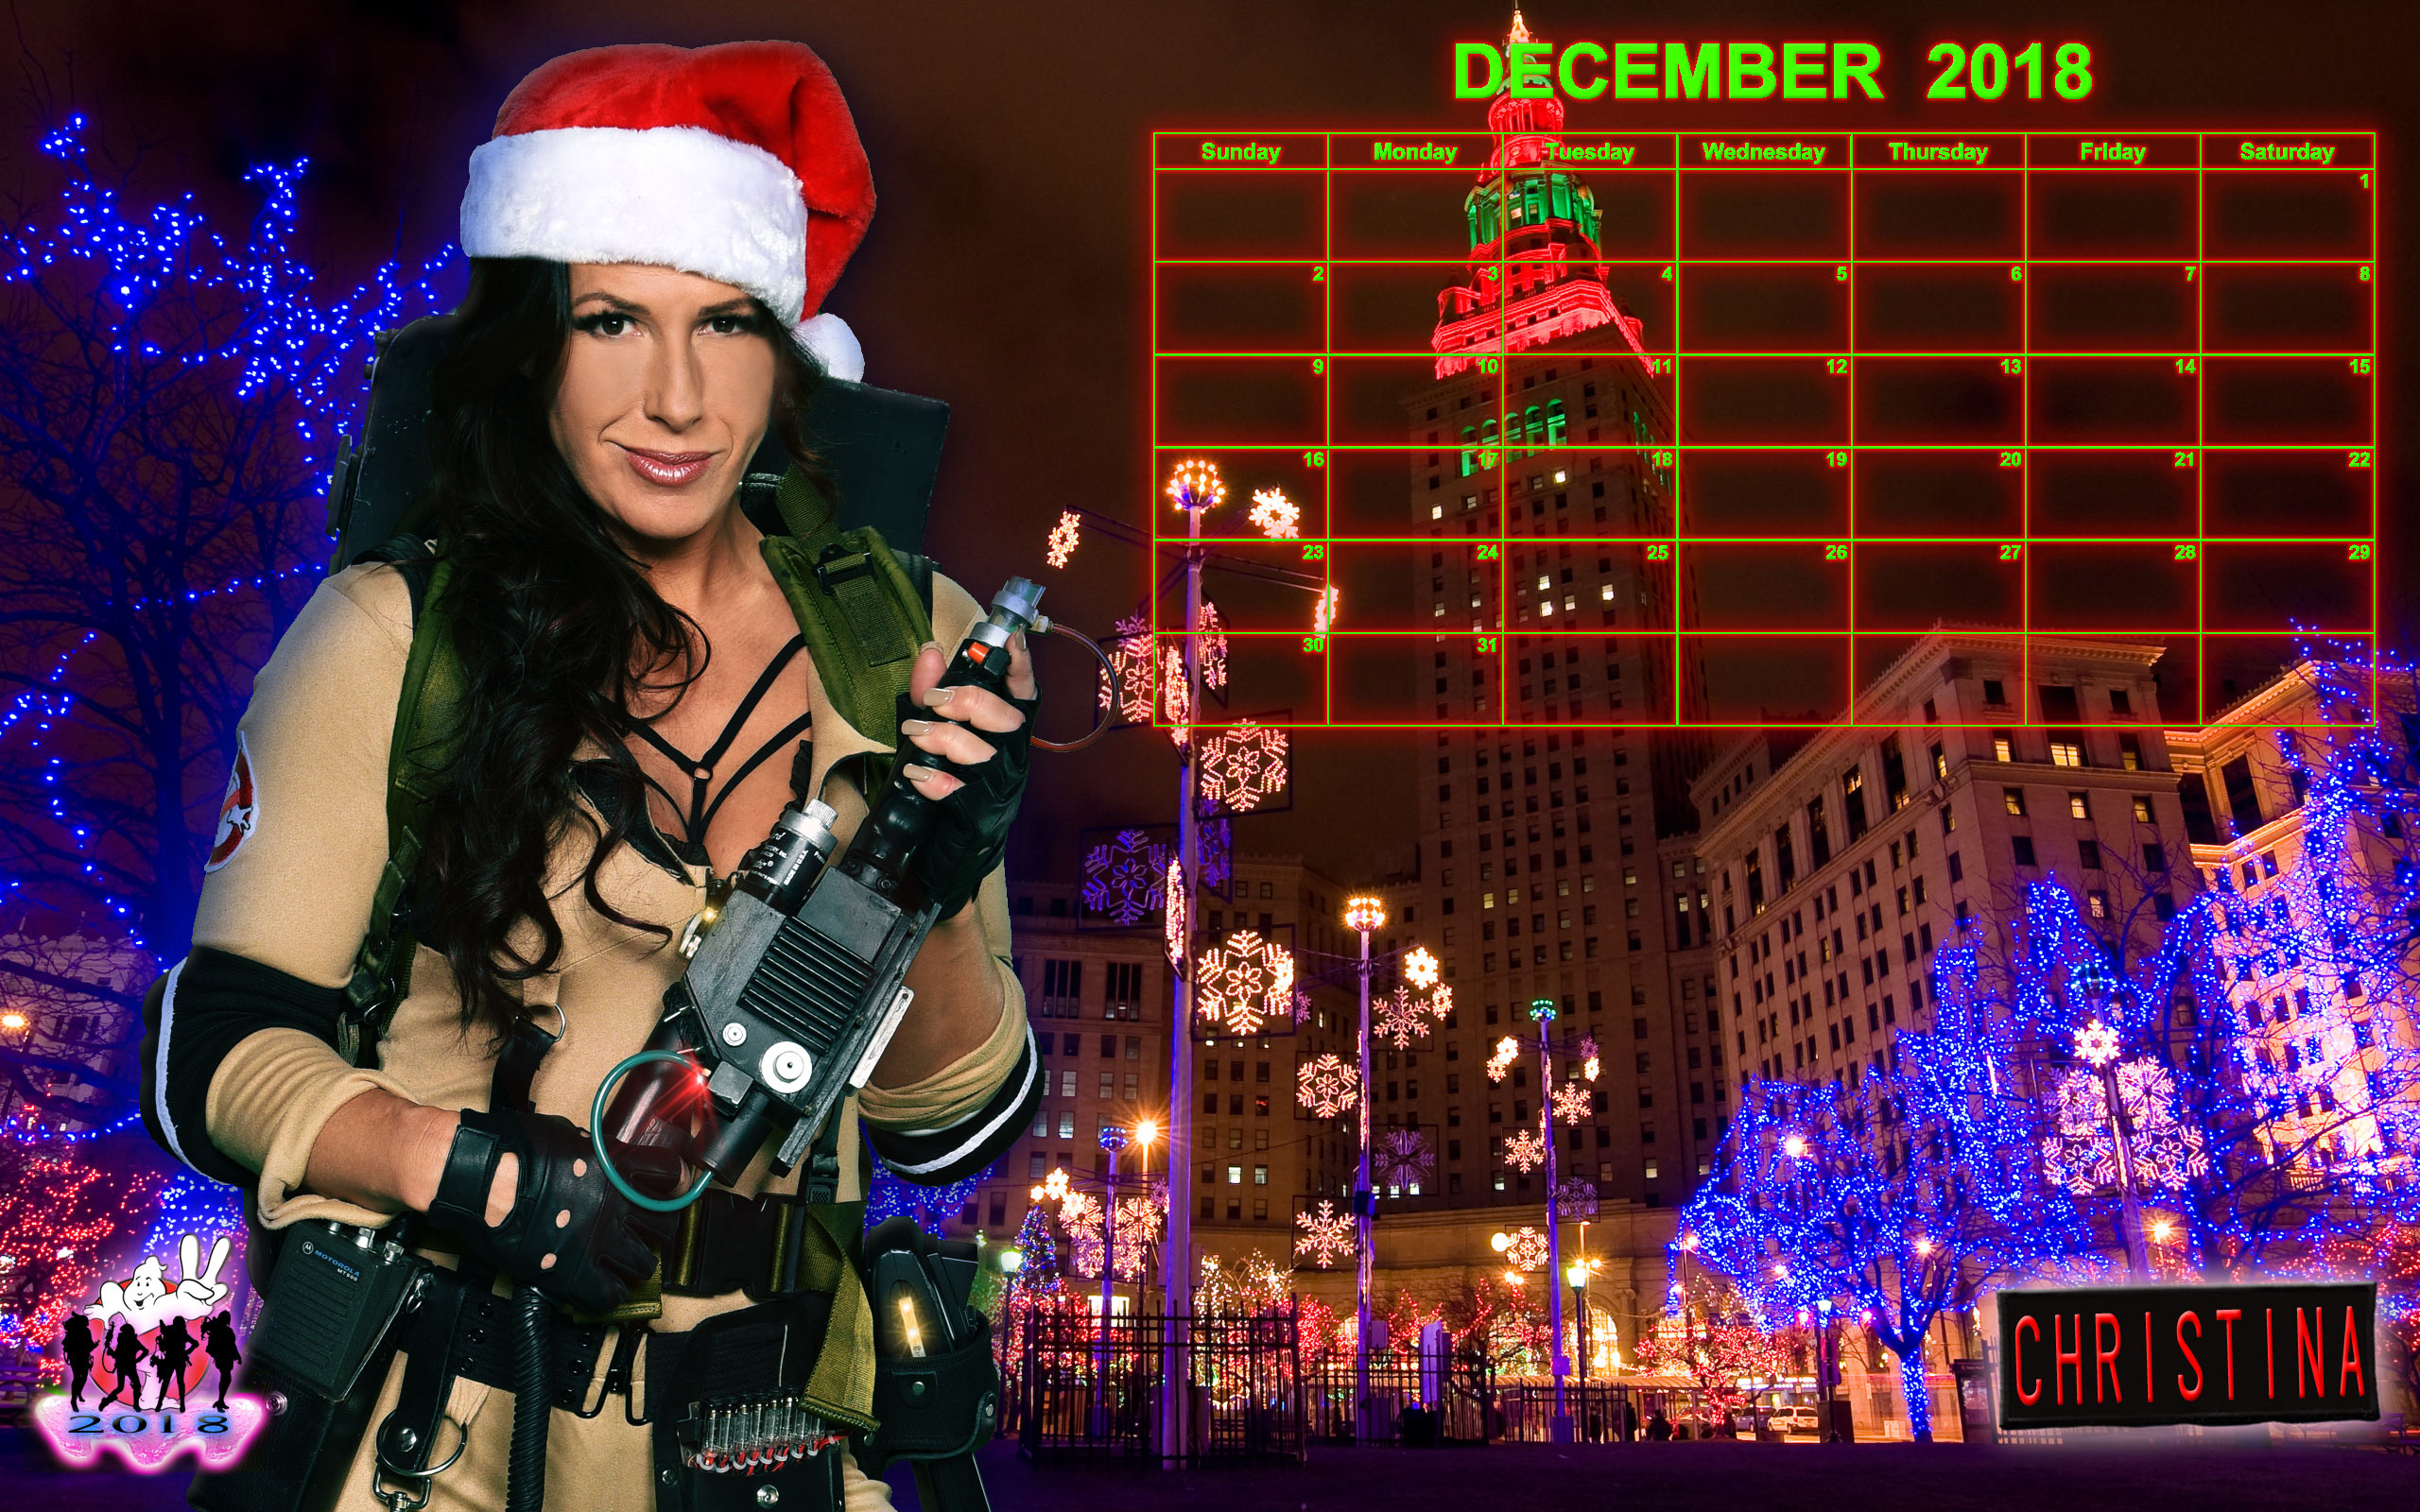 Occult Calendar December 2019 Ghostbusters Calendar: December 2018   Ghostbusters News